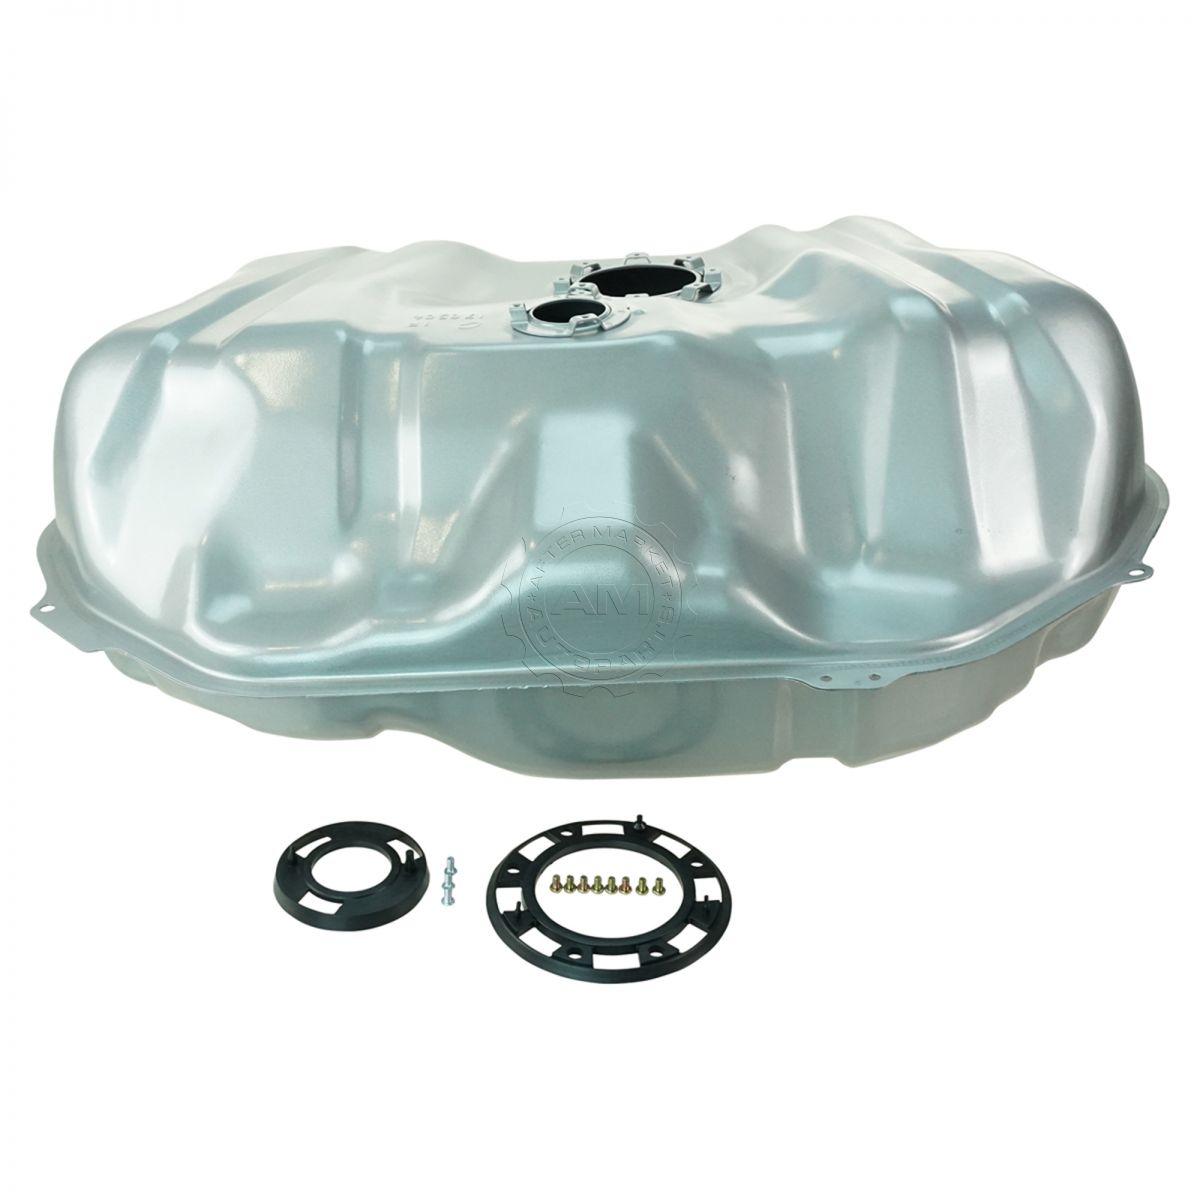 fuel gas tank for honda accord acura tl 3 2tl cl 192659142320 ebay rh ebay com 2010 Acura TL Dash Lights Acura TL Custom